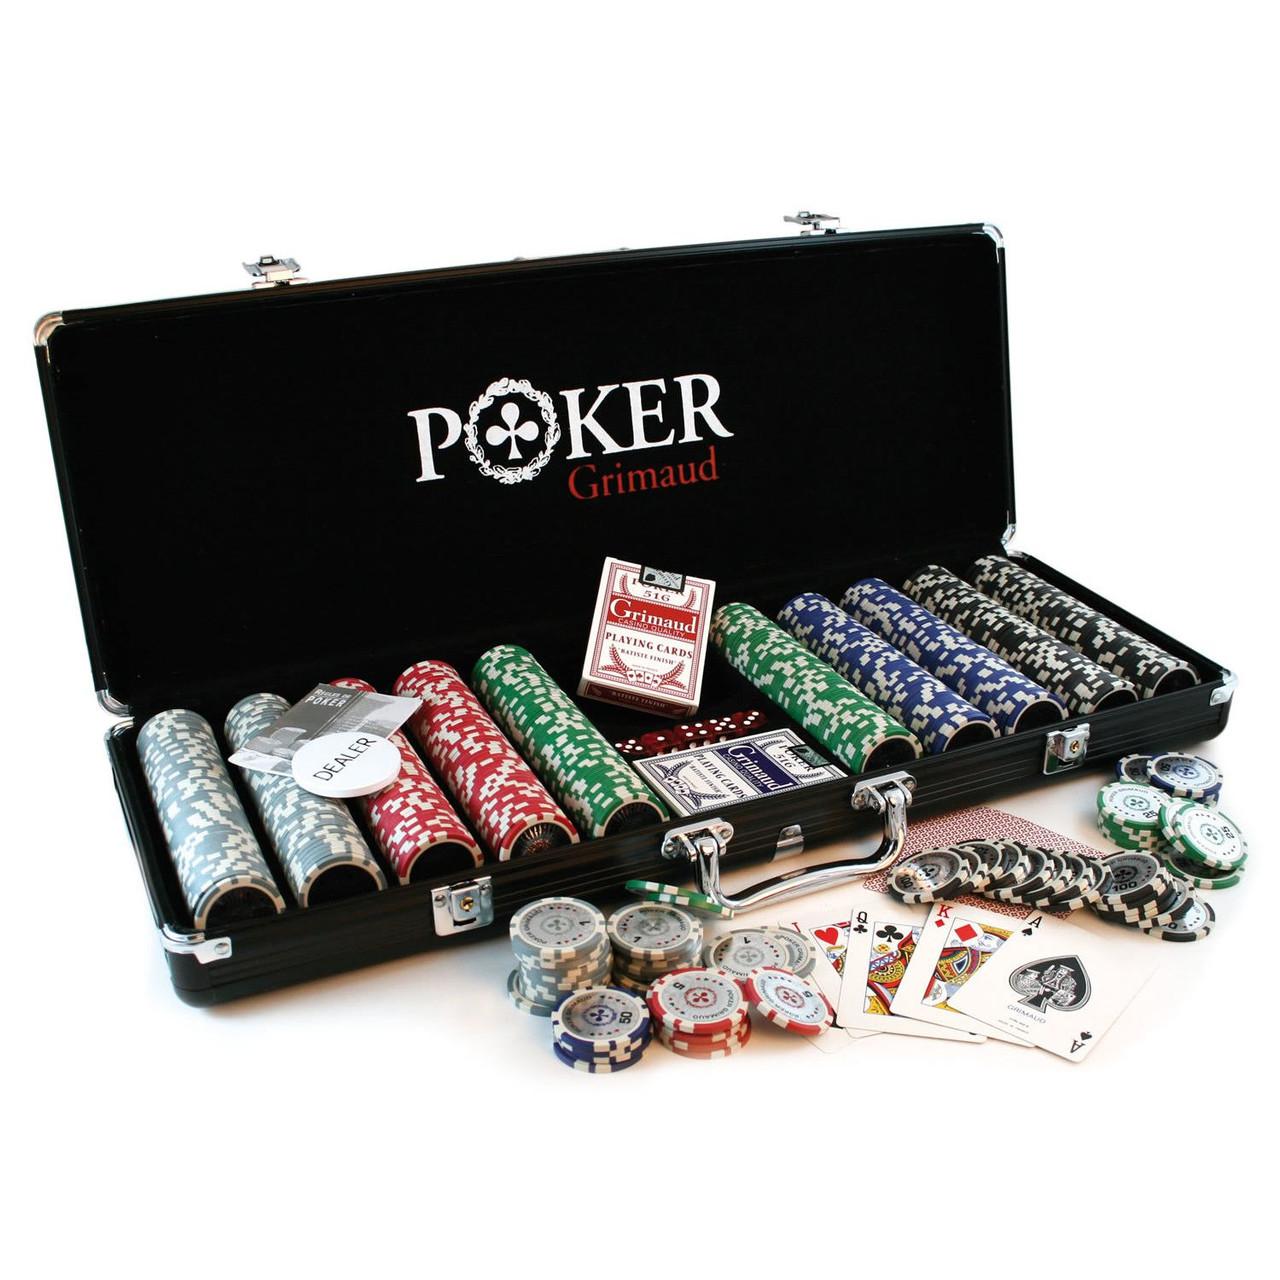 Set poker profesional Grimaud (Franta), 500 jetoane (11,5g), 2 pachete carti de joc, 5 zaruri